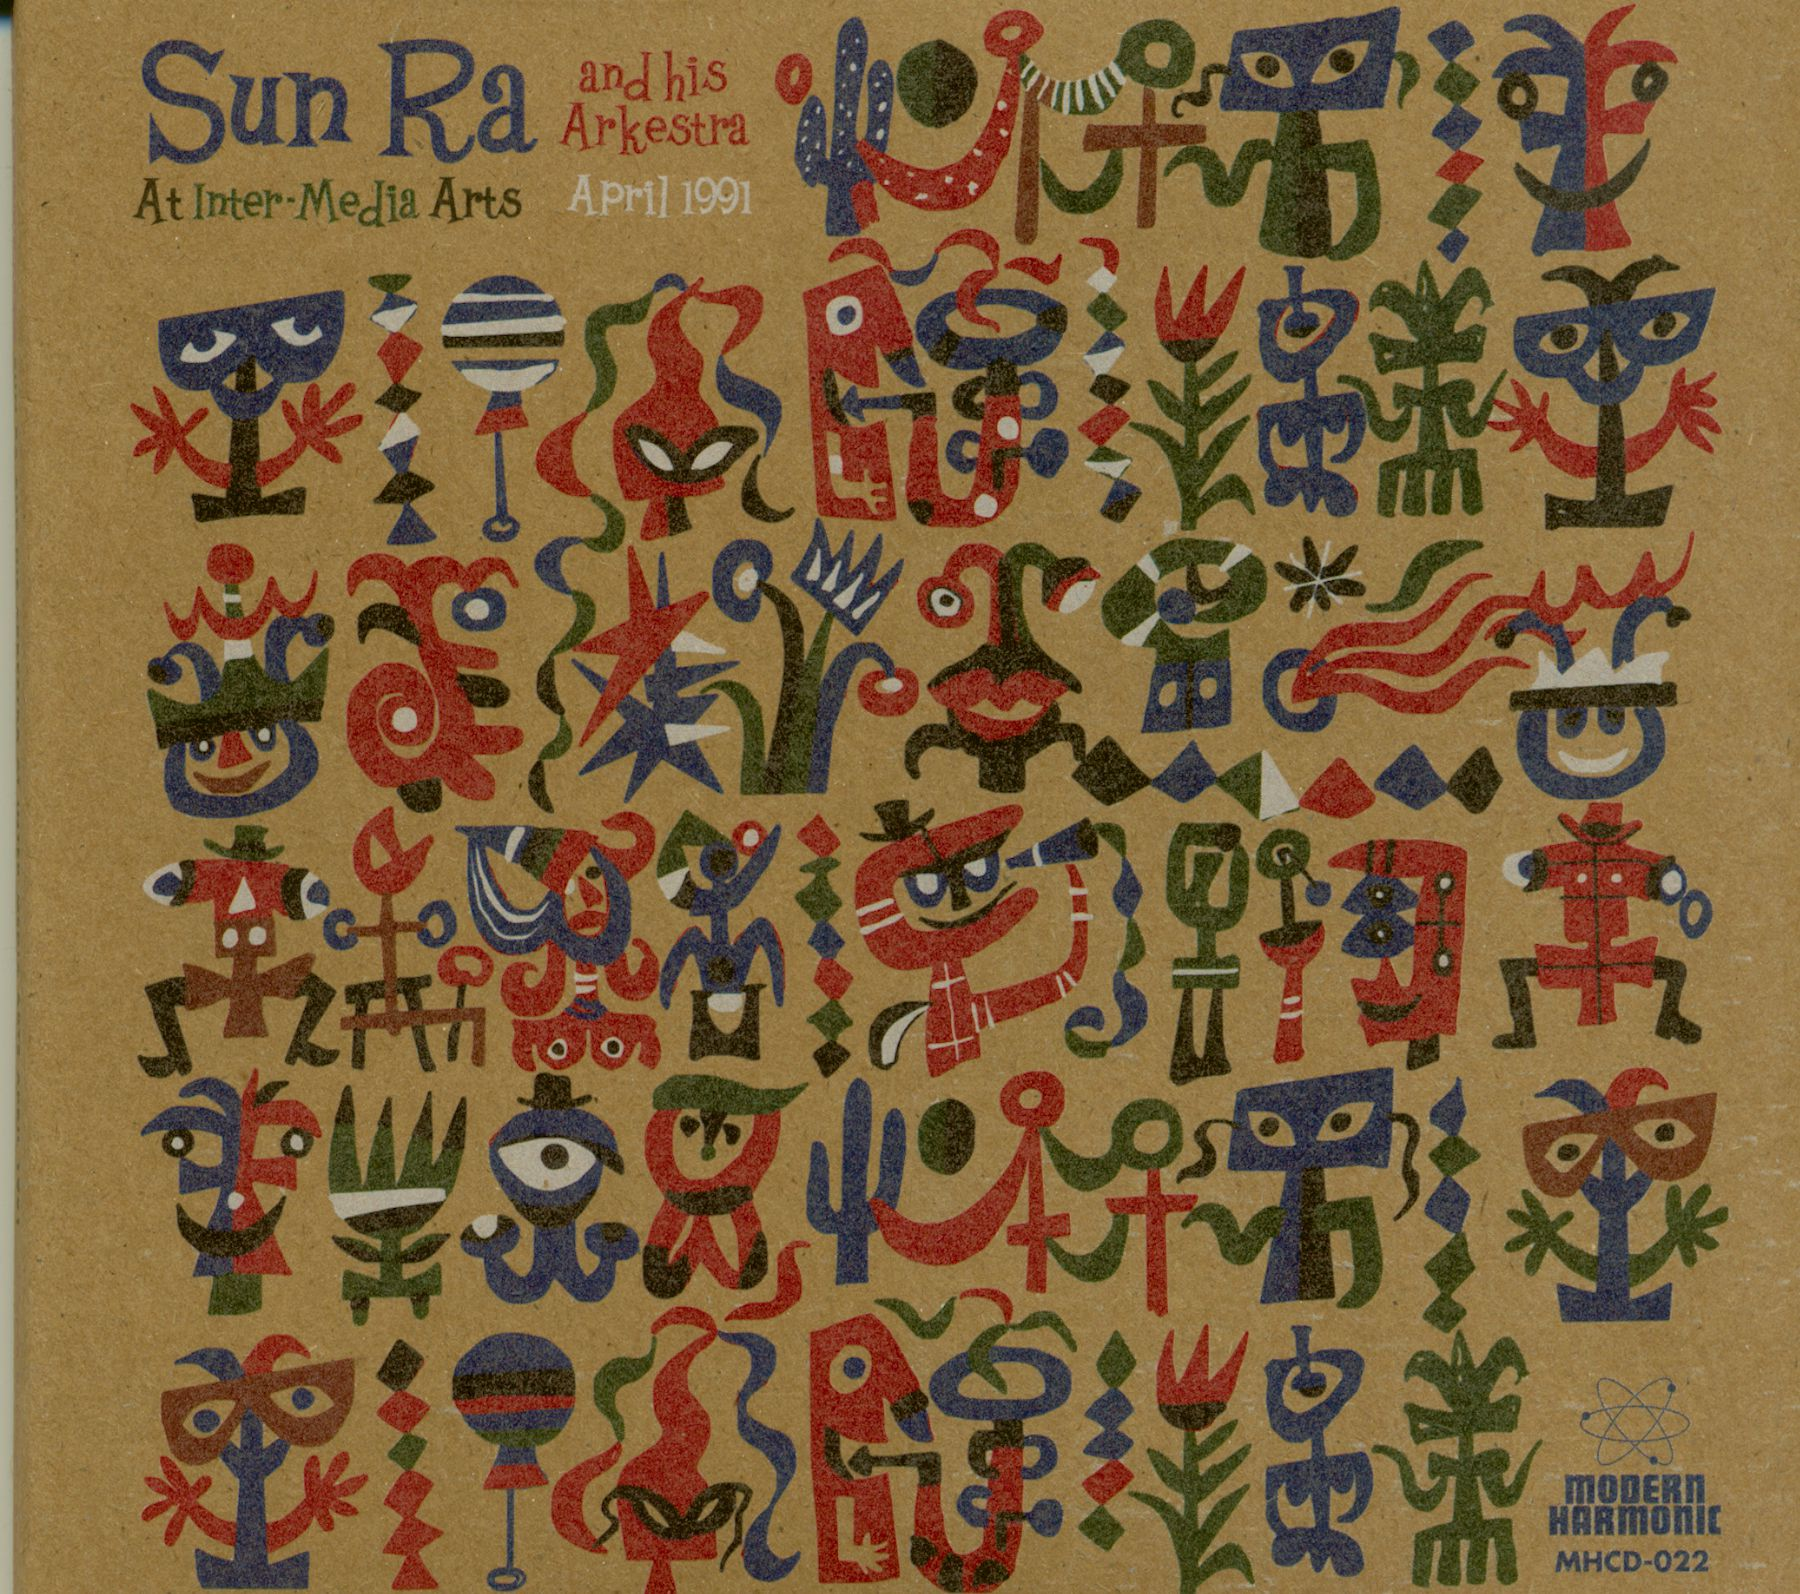 Sun Ra & His Arkestra LP : Live At Inter-Media Arts (3-LP) - Bear Family Records